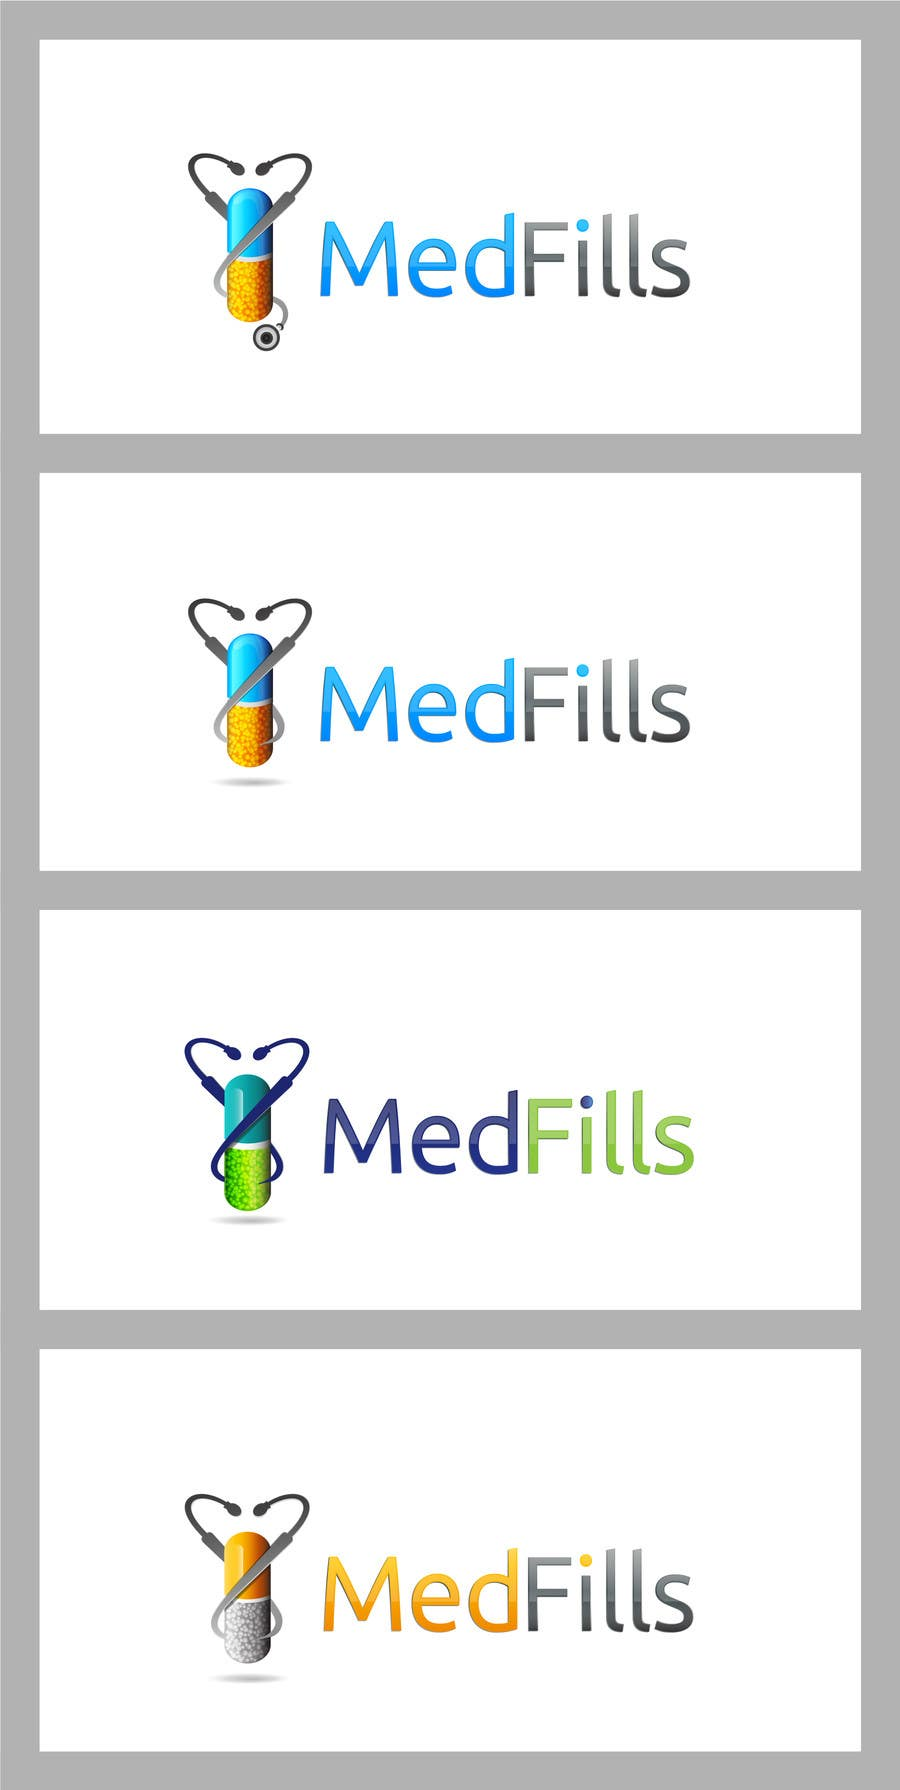 Bài tham dự cuộc thi #111 cho Design a Logo for my Medication Management Business